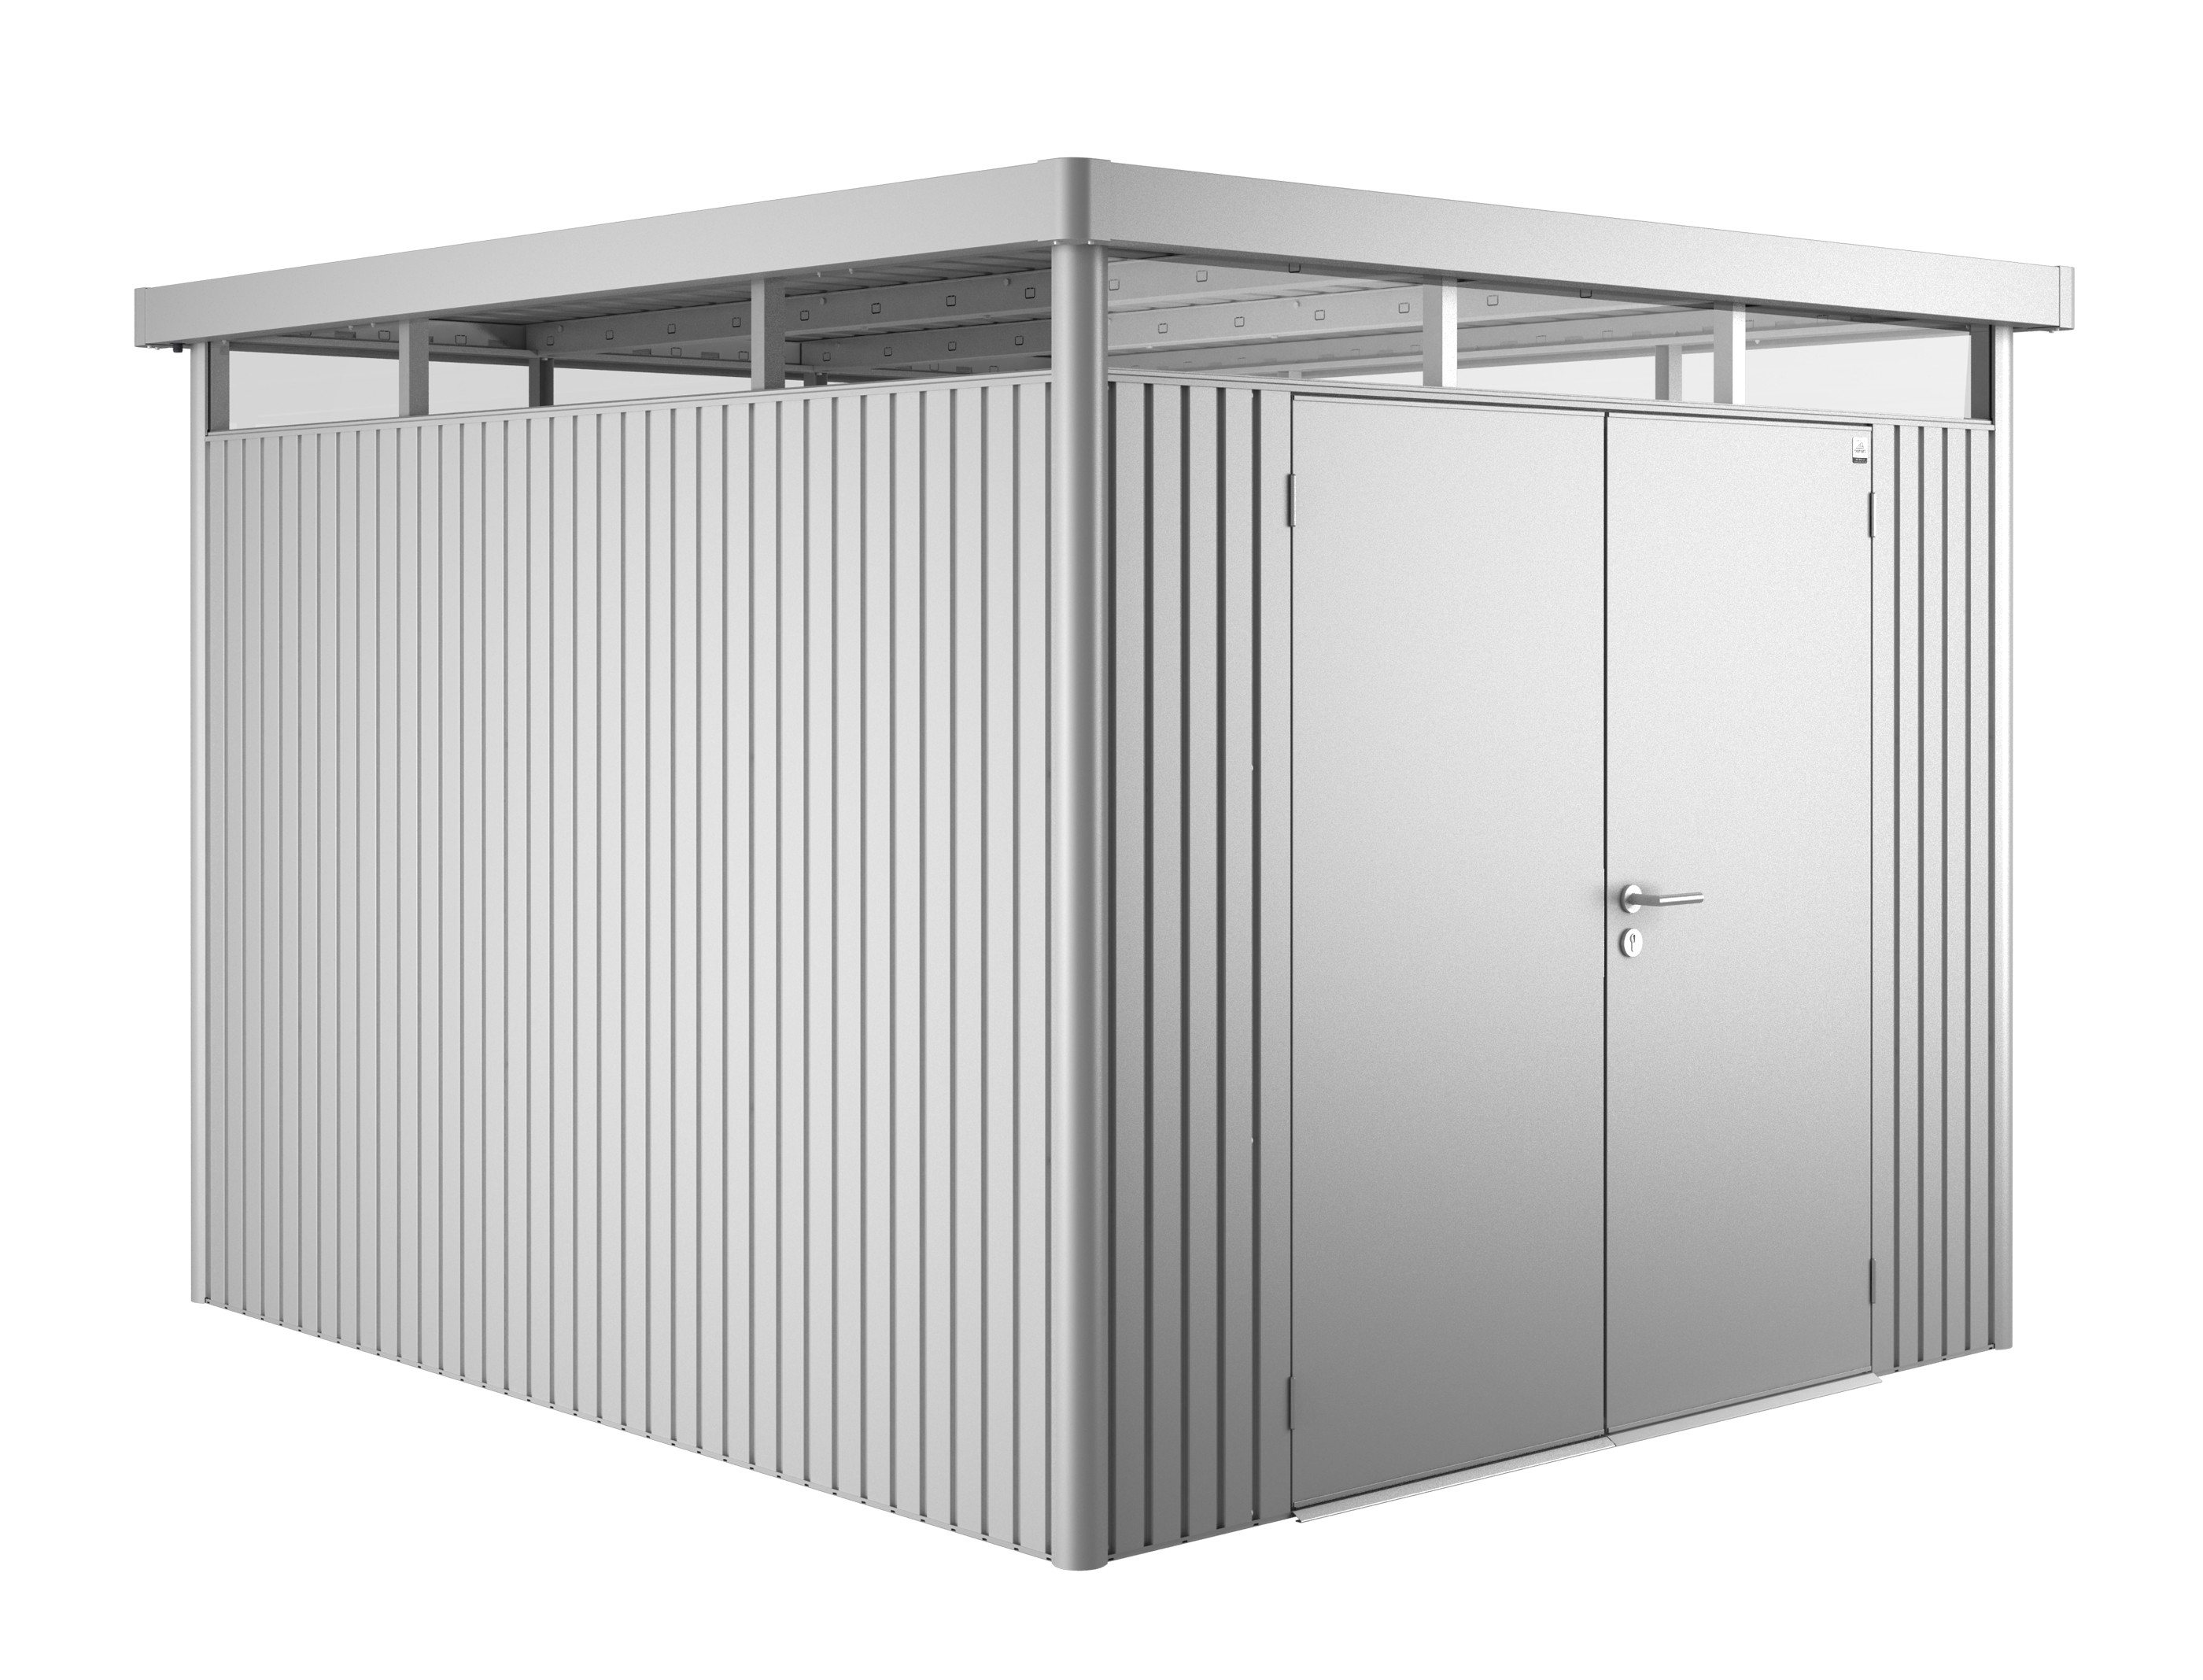 ger tehaus biohort highline h5 silber metallic dt 275x315x222cm bei. Black Bedroom Furniture Sets. Home Design Ideas